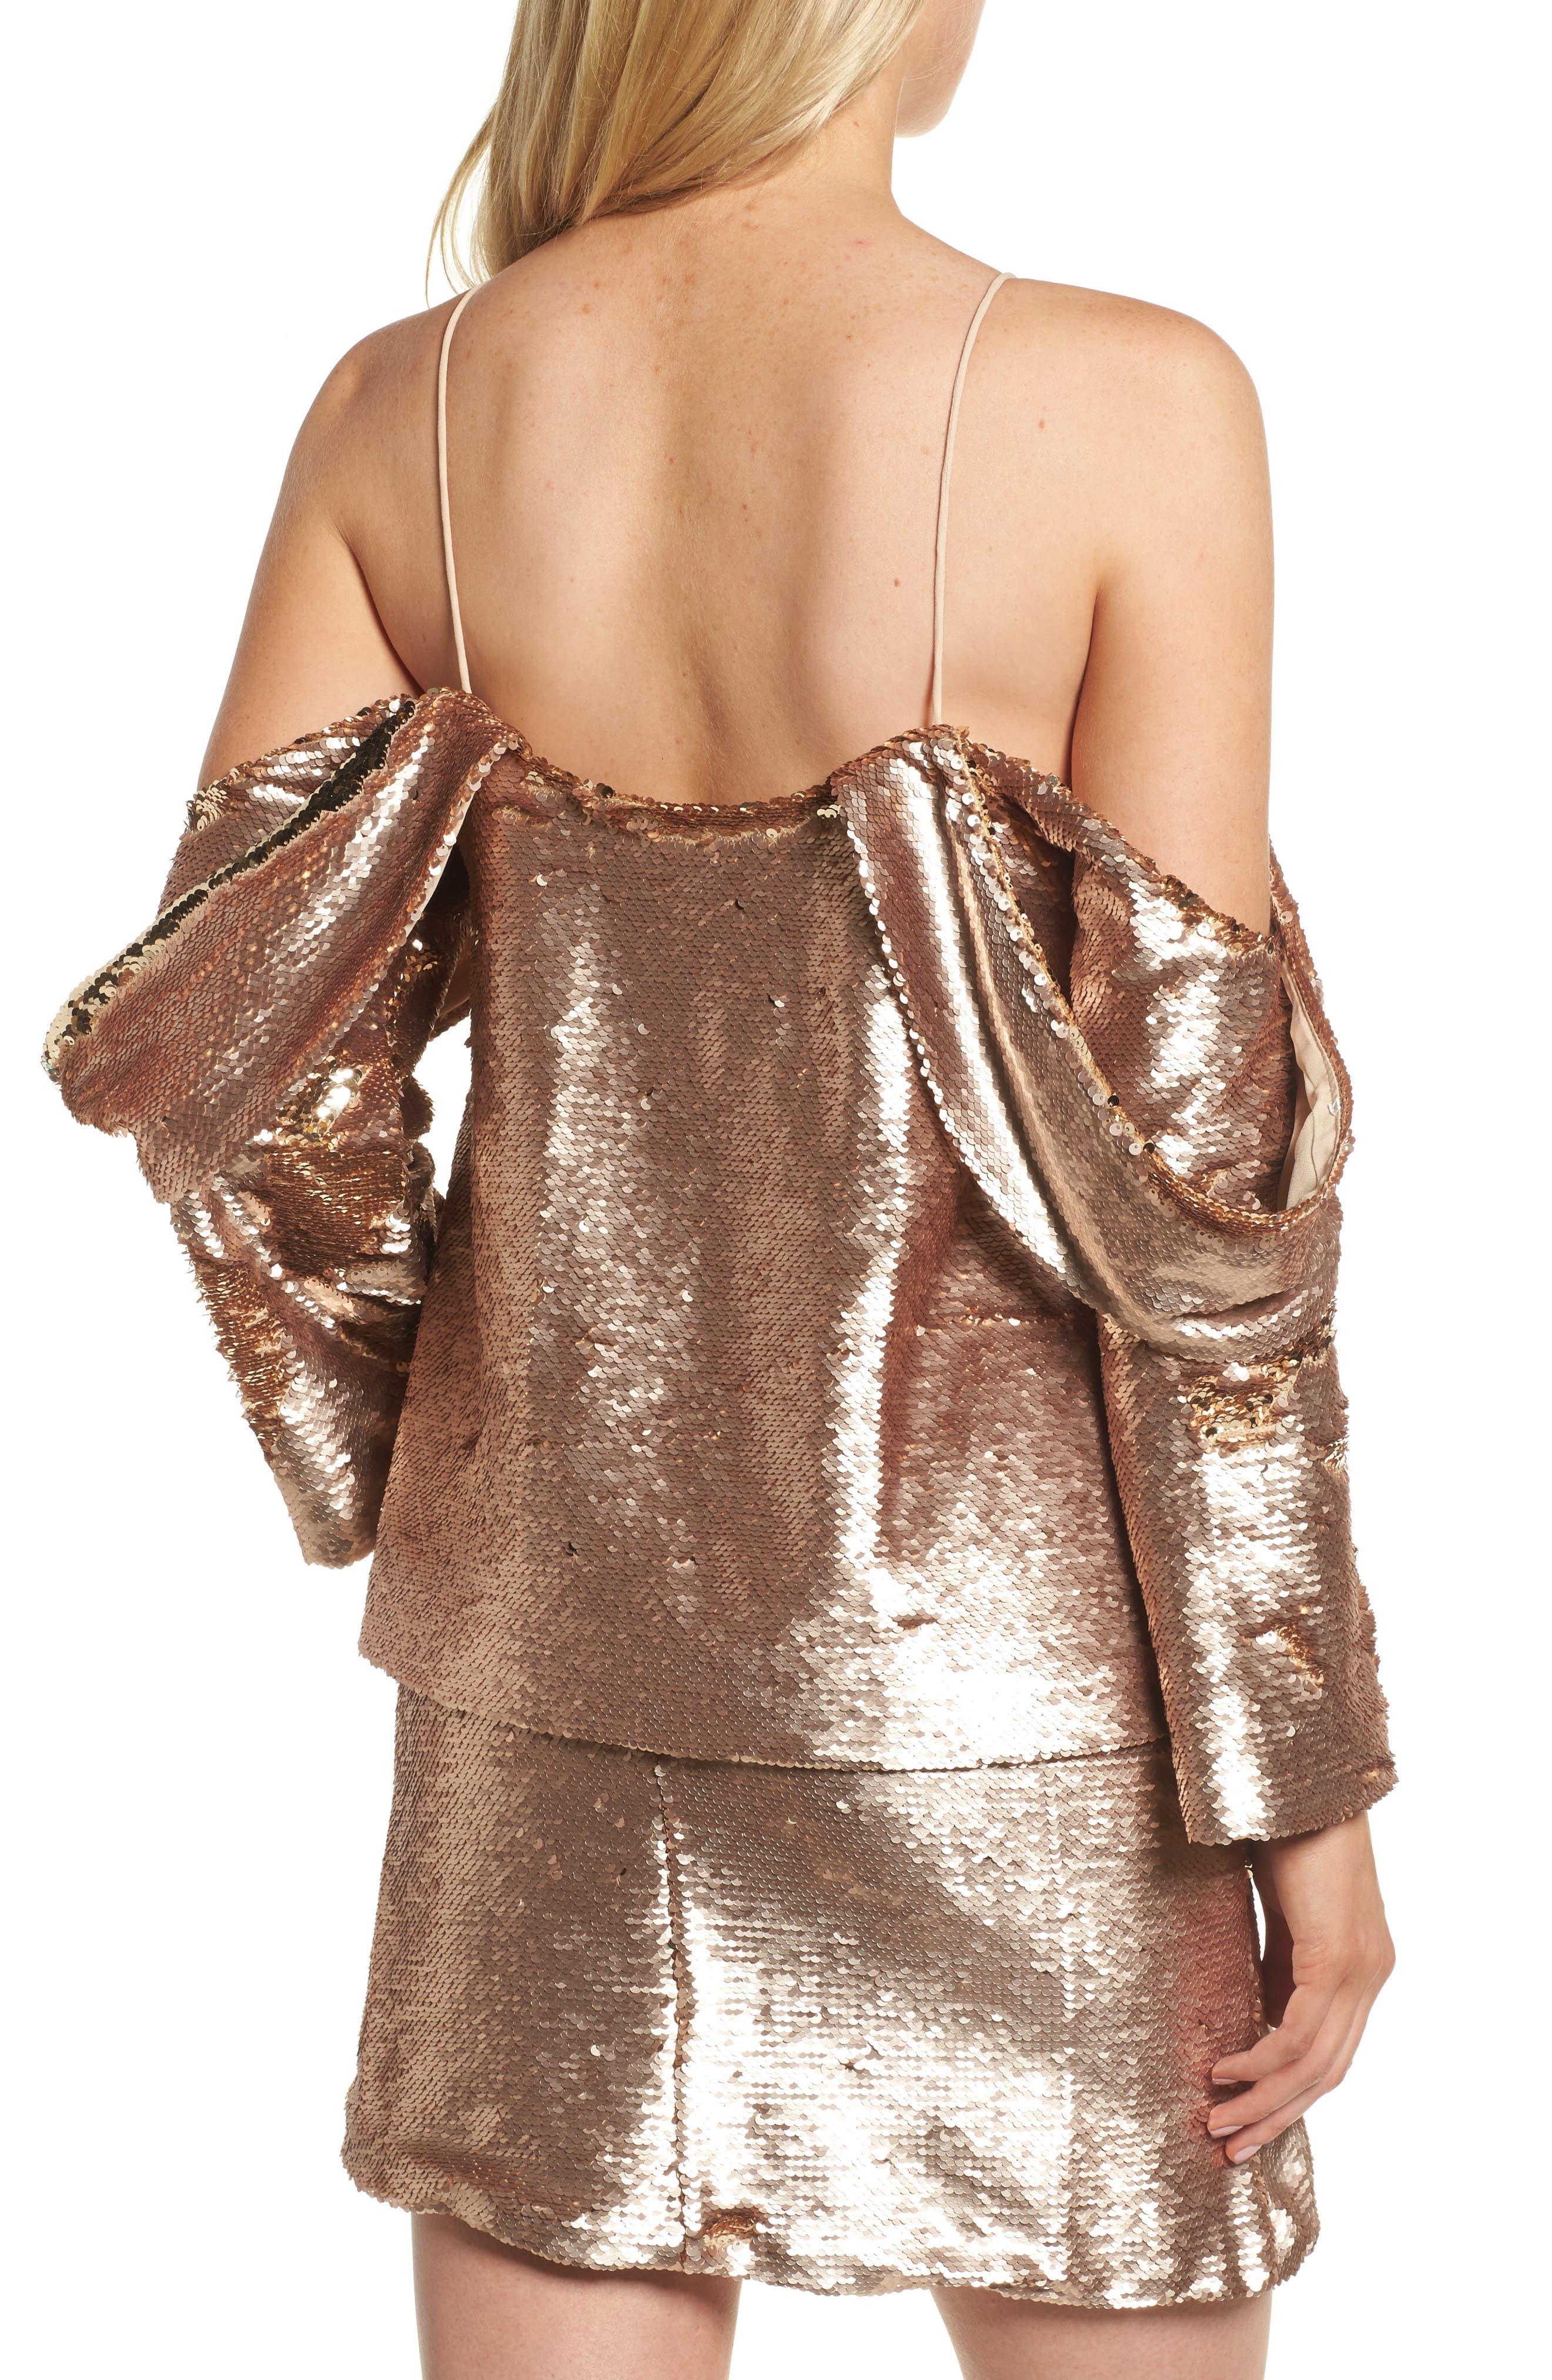 Revolution Off the Shoulder Sequin Top,                             Alternate thumbnail 2, color,                             Champagne Blush